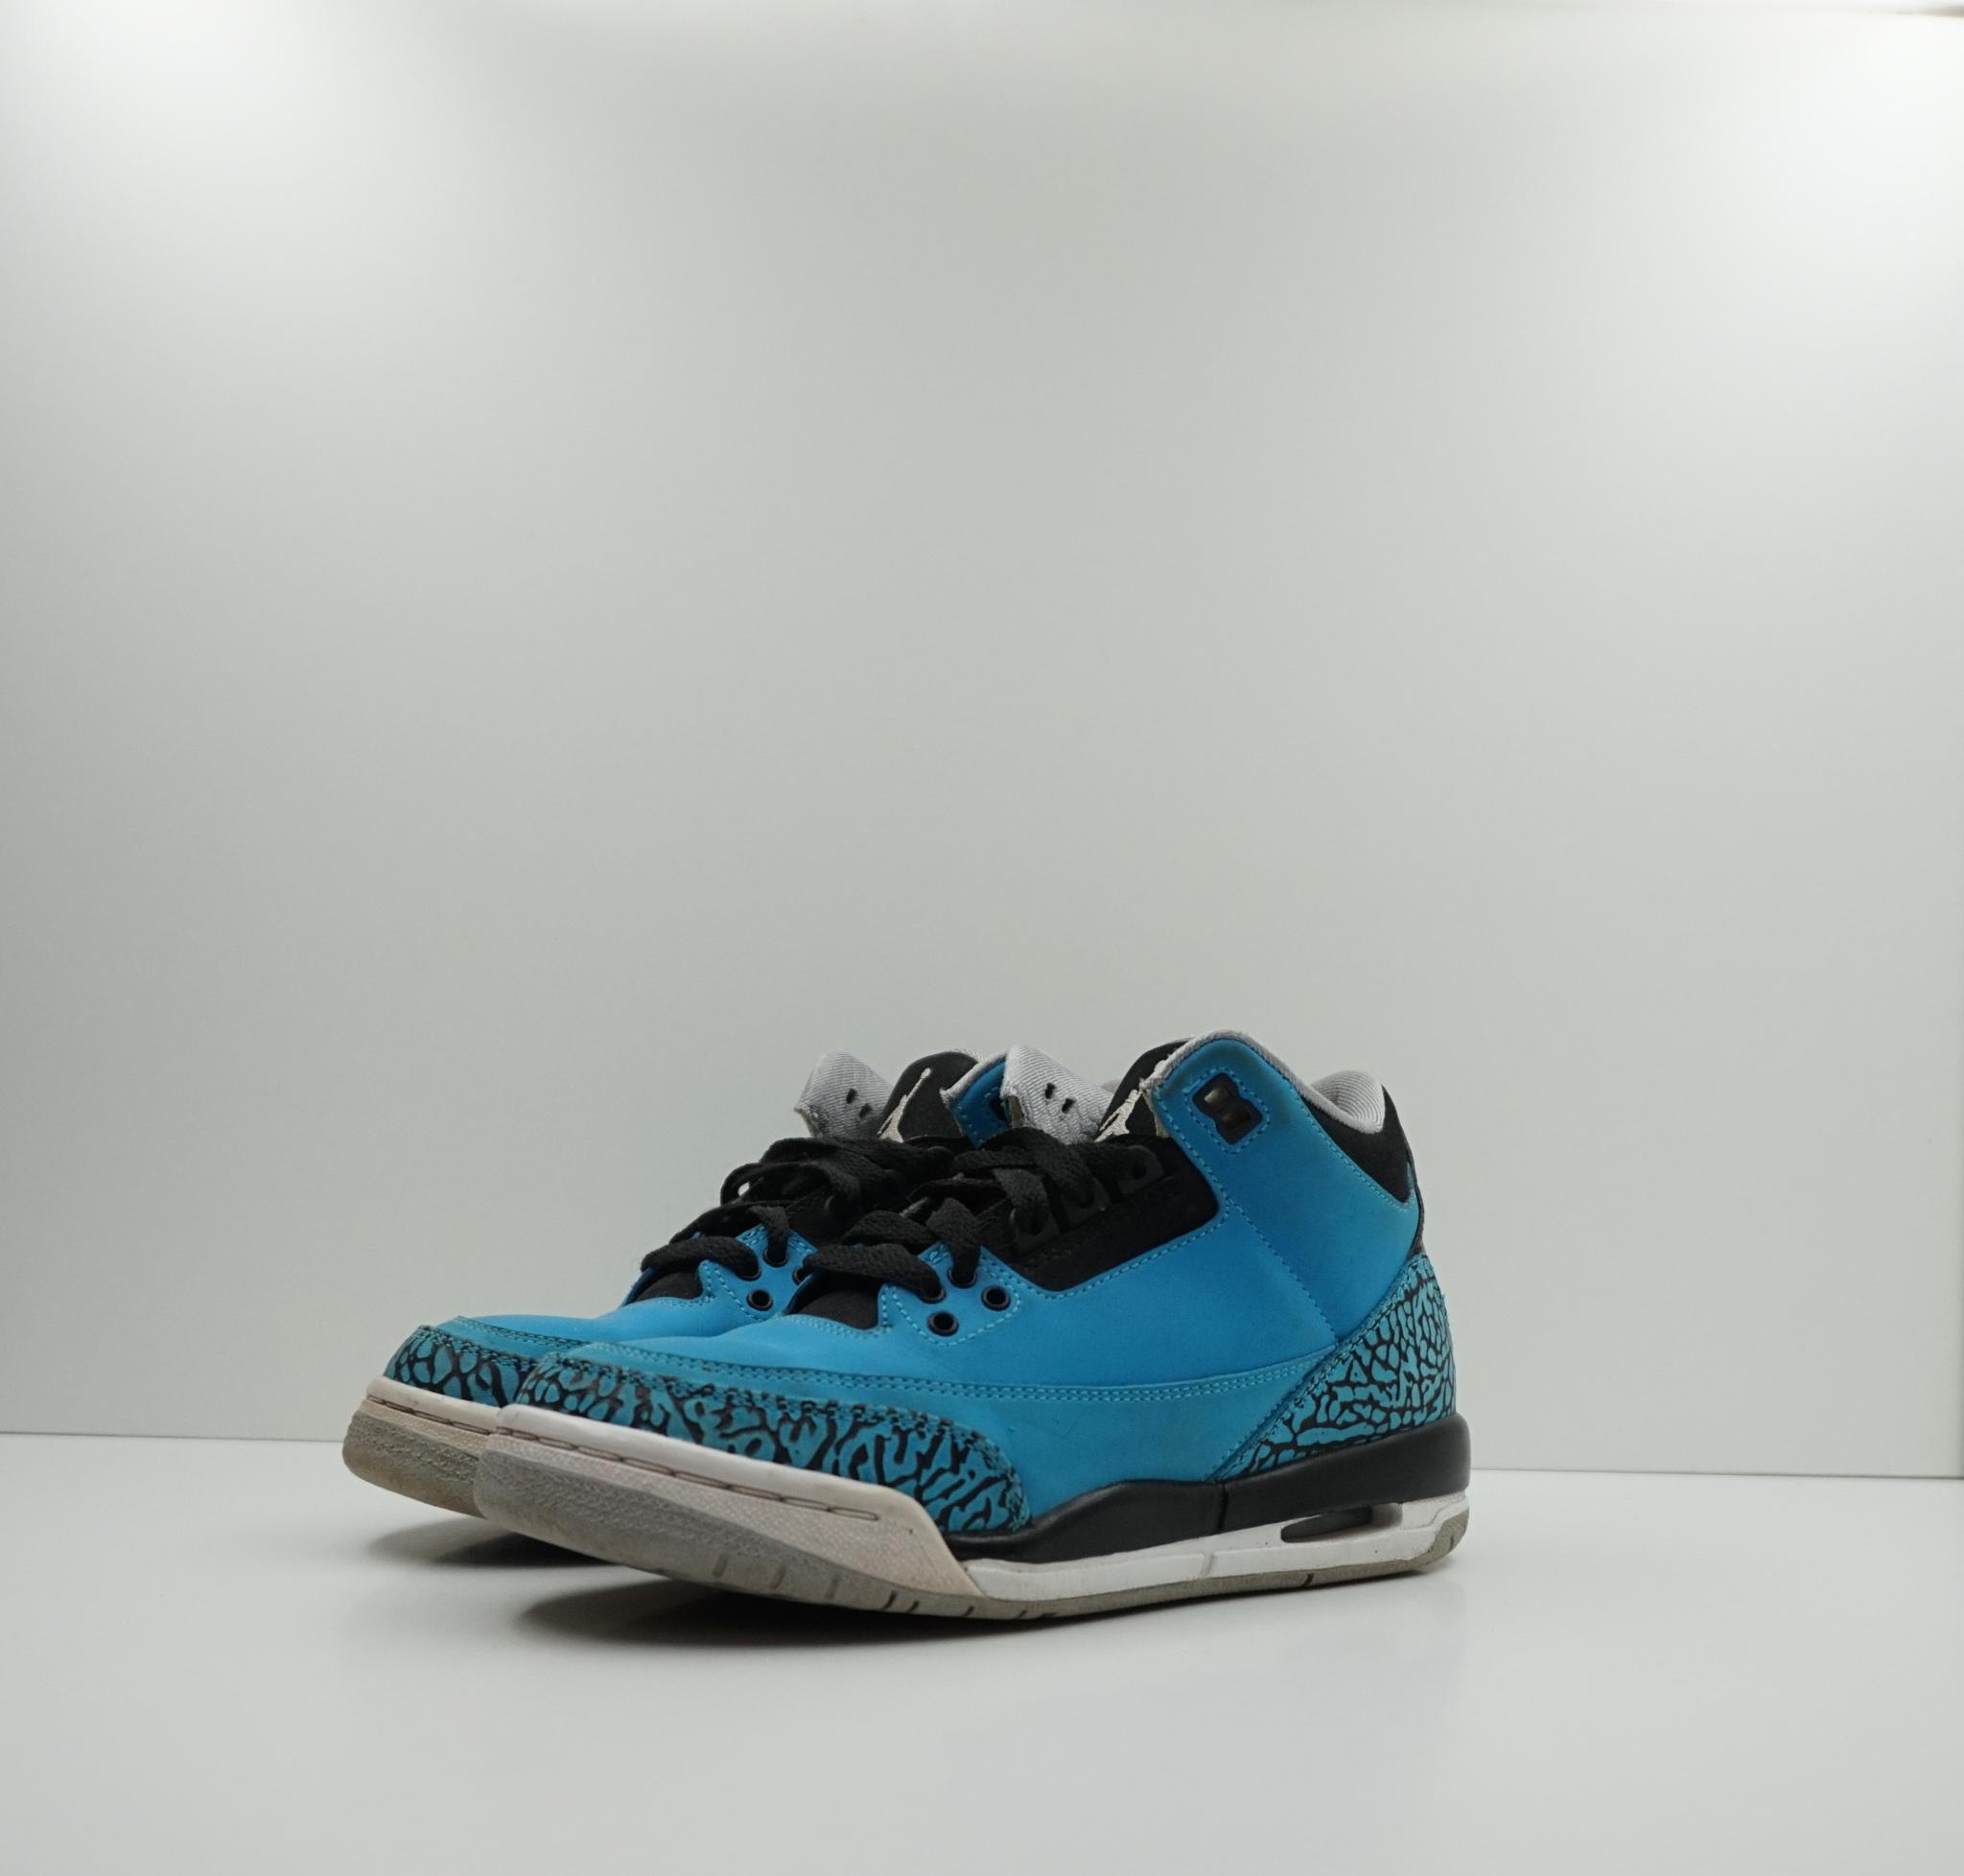 Jordan 3 Retro Powder Blue GS